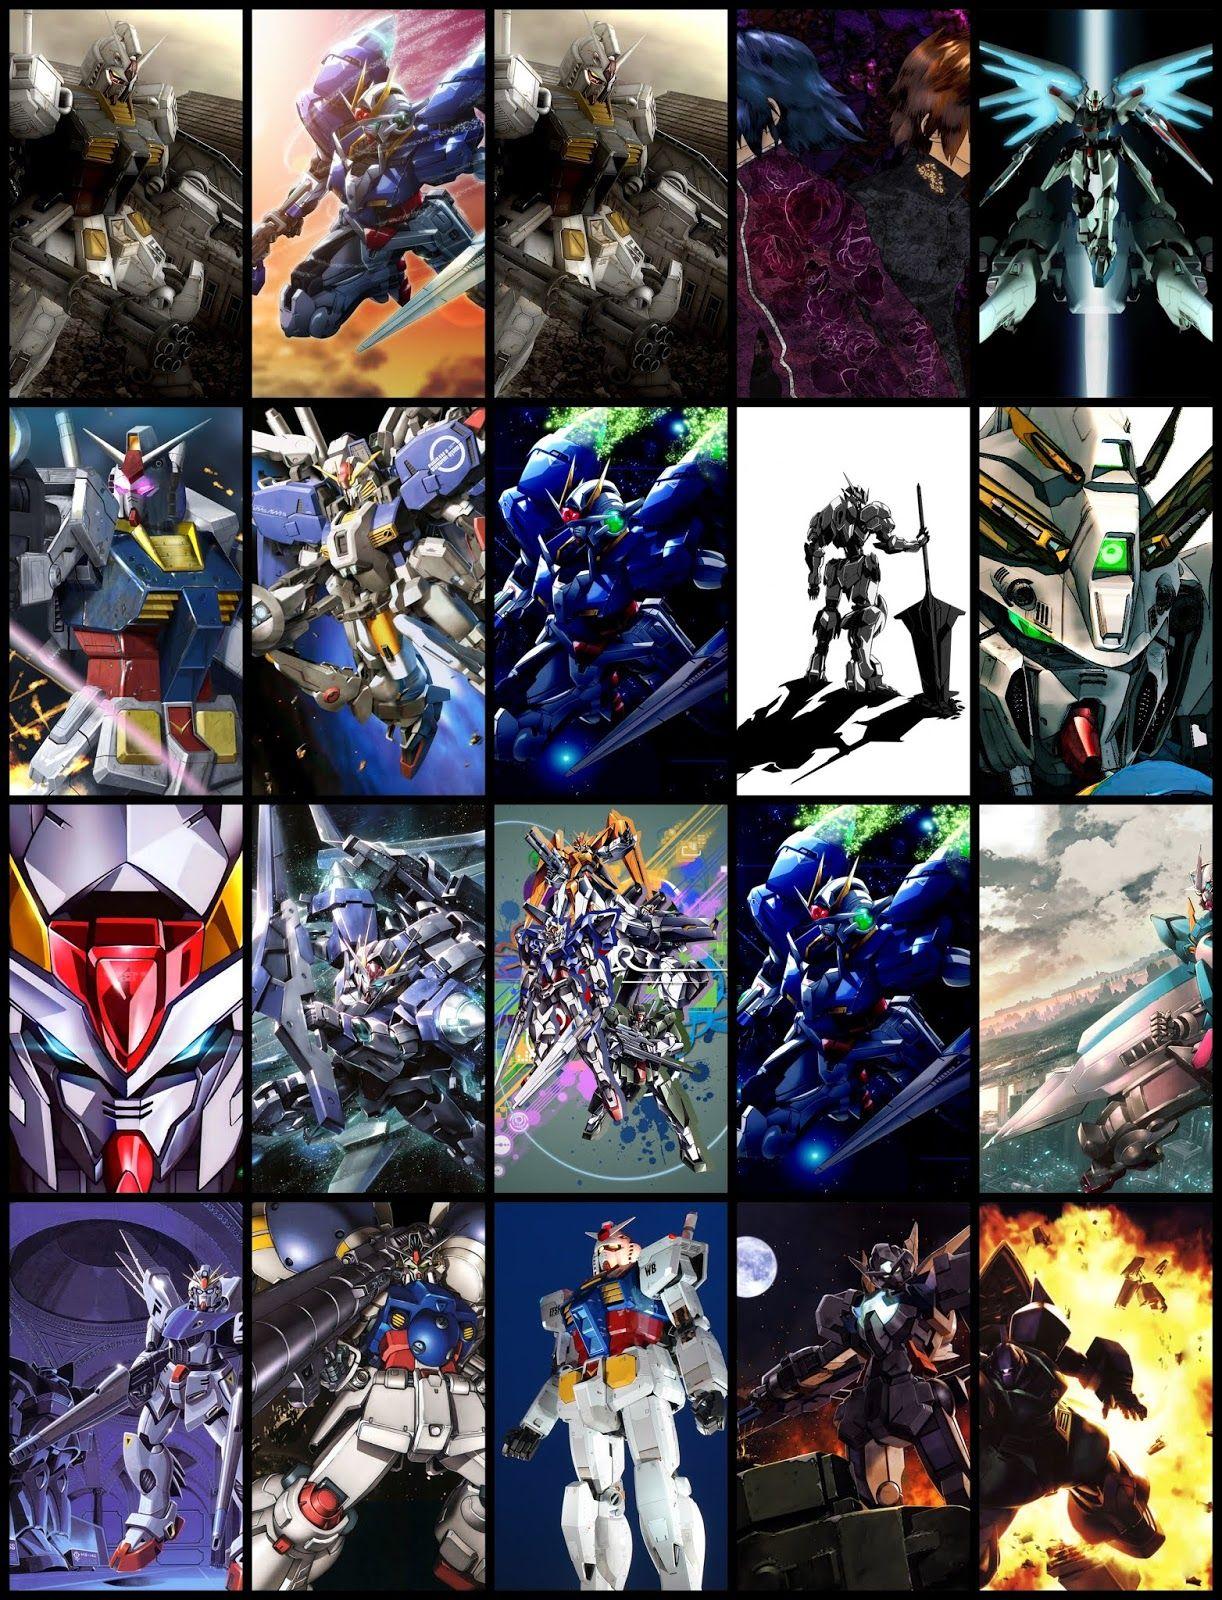 Gundam Wallpaper Pack For Android Phone (Part 04) Gundam